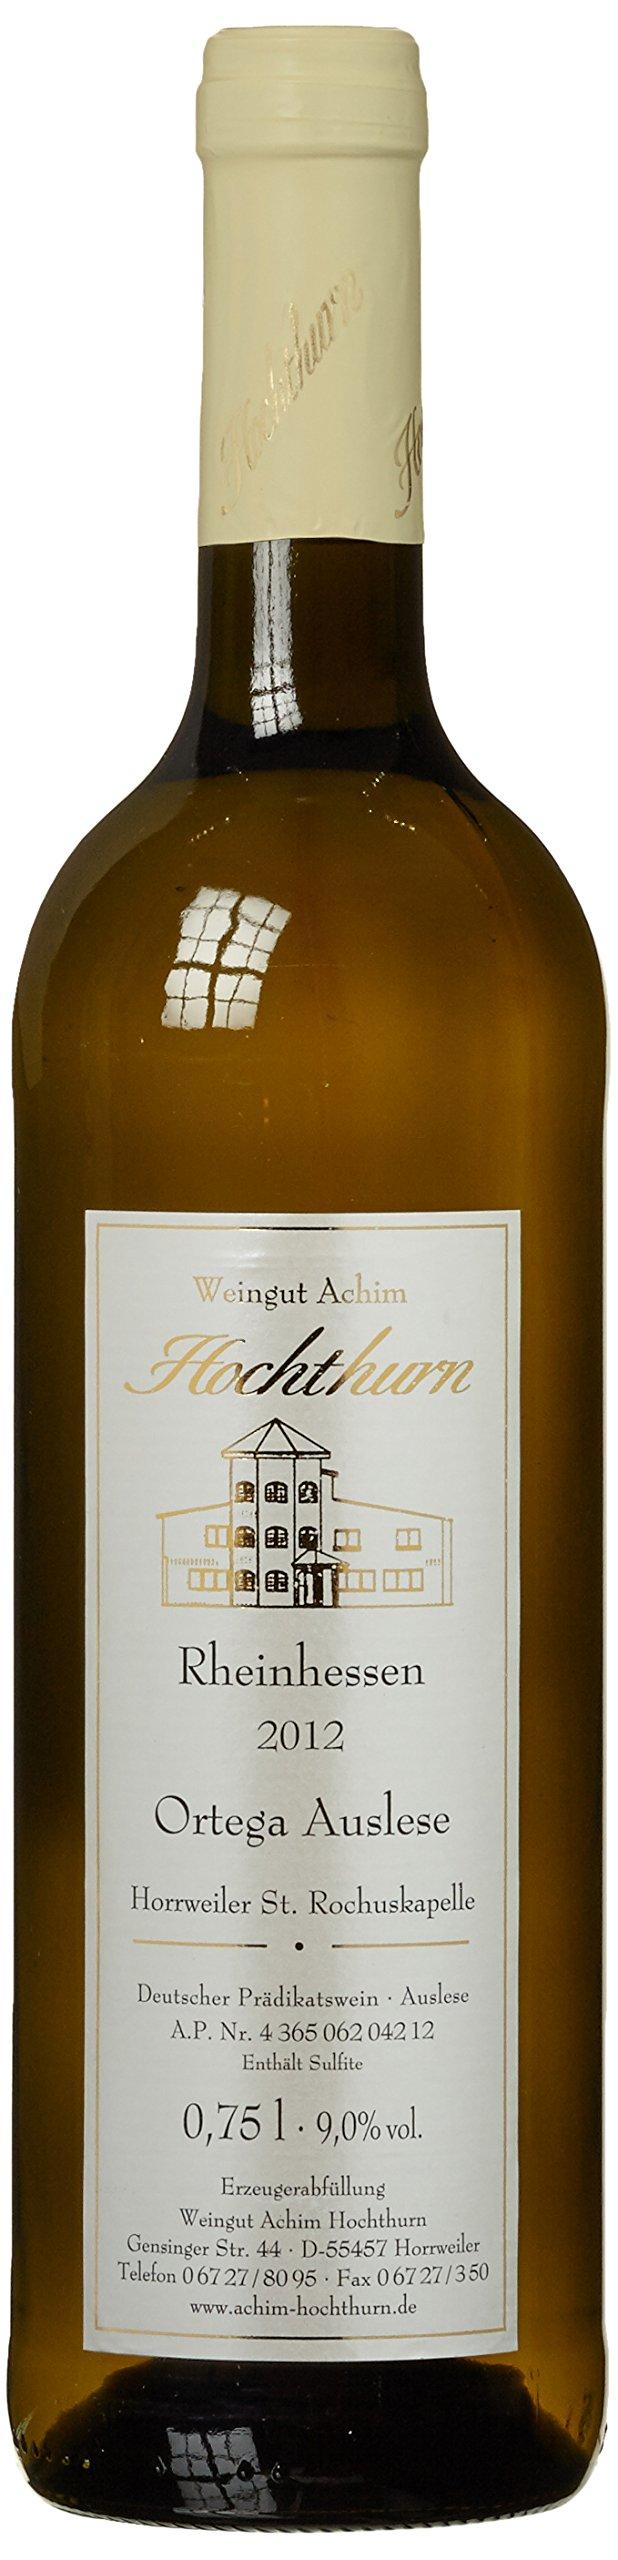 Weingut-Achim-Hochthurn-Ortega-Auslese-Edelsss-6-x-075-l